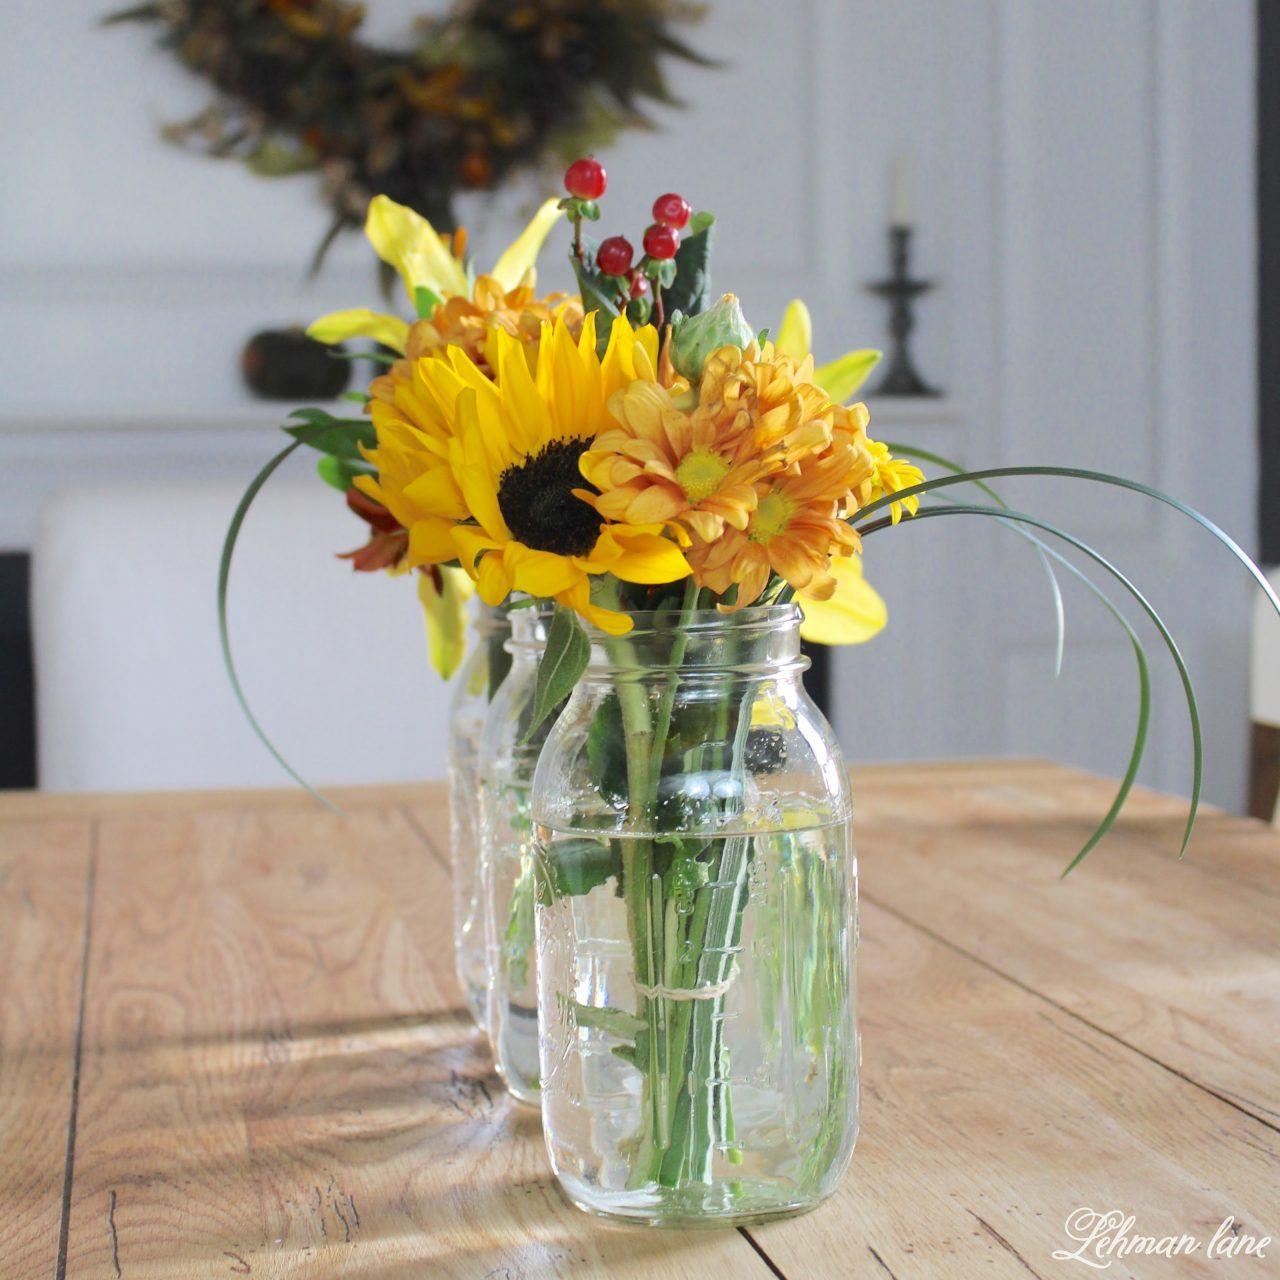 Diy Simple Flower Arrangement Tips 3 Flower Displays In 15 Minutes From The Grocery Store Lehman Lane Flower Arrangements Simple Flowers Flowers,Modern Kitchen Countertops